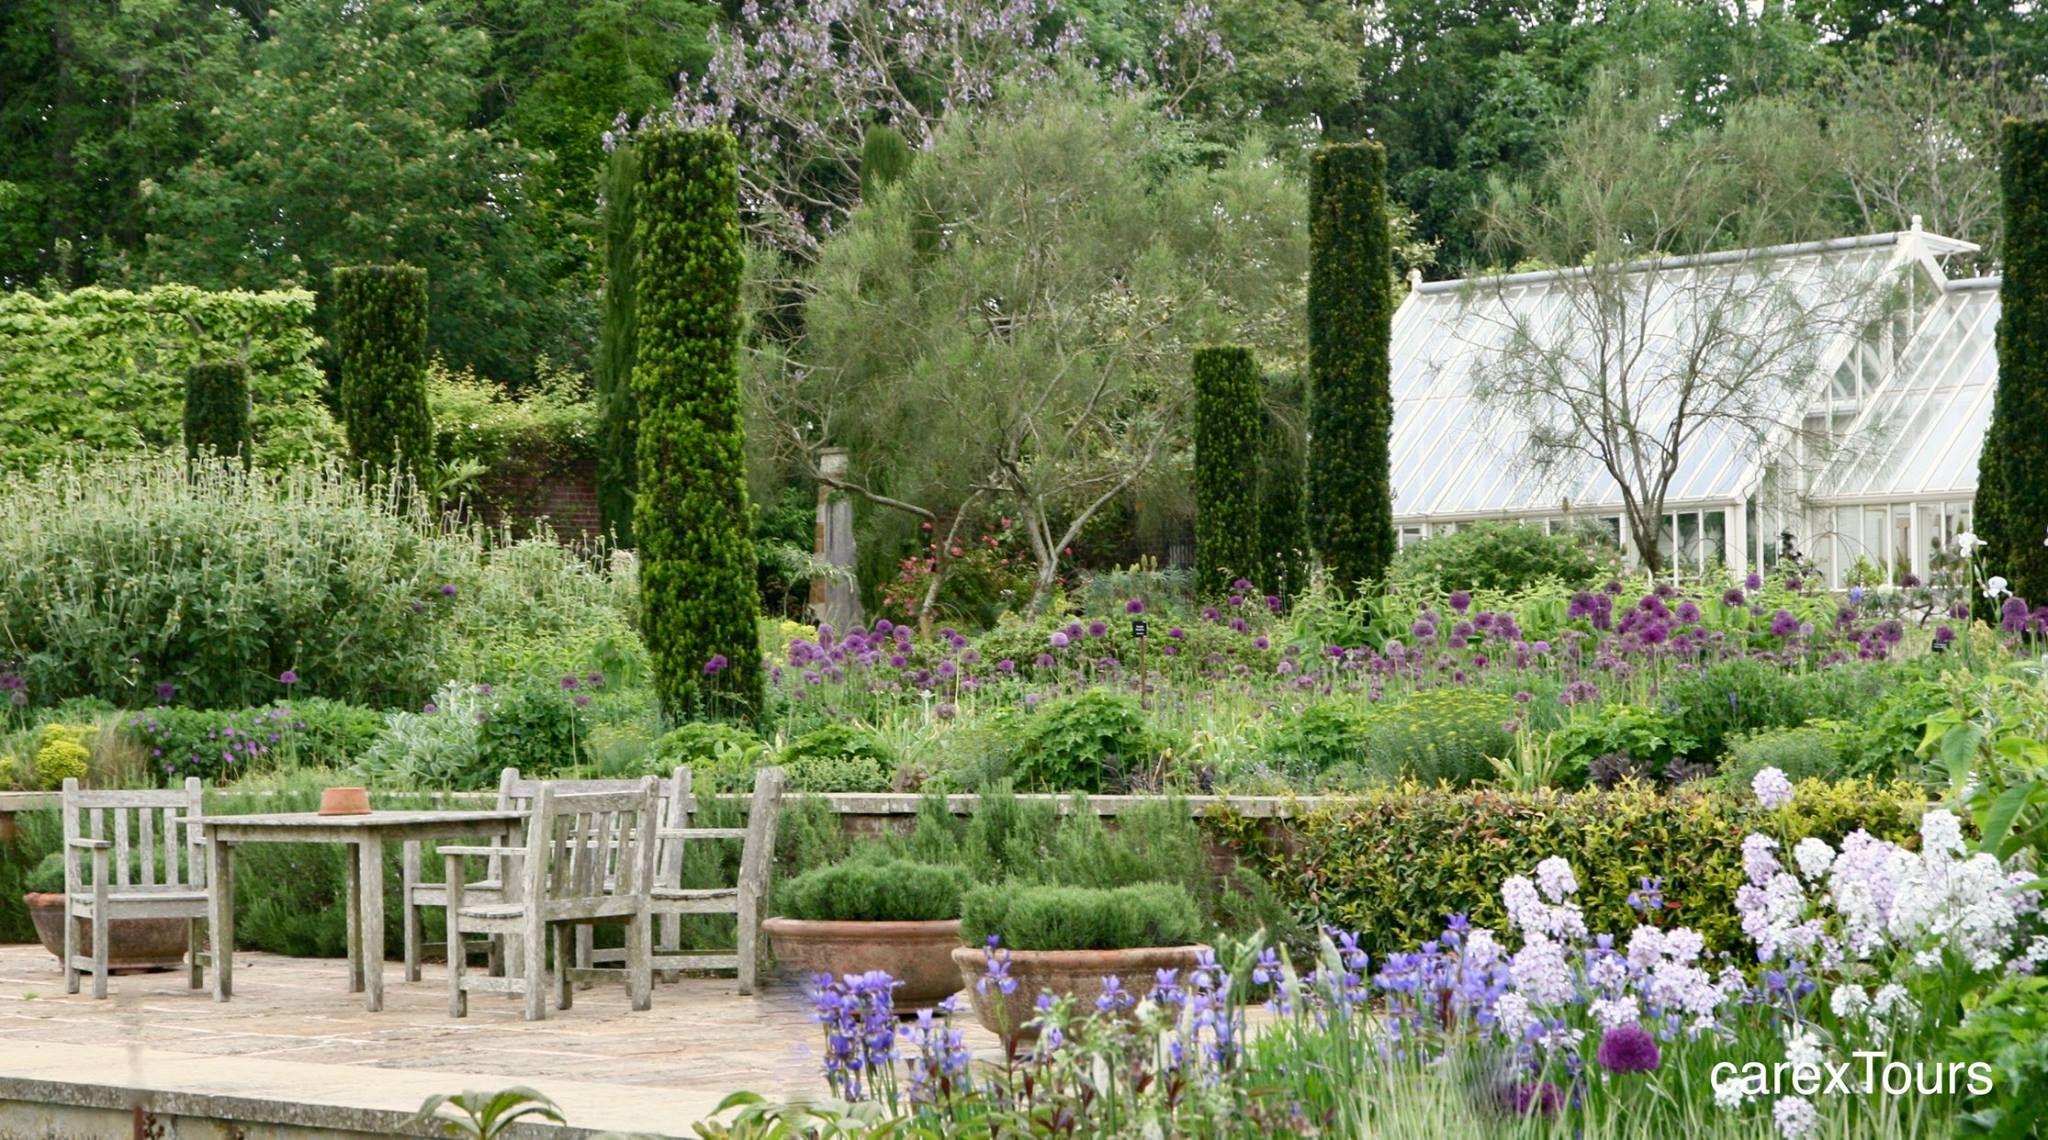 garden design by carolyn mullet 31 view across the upper terrace in